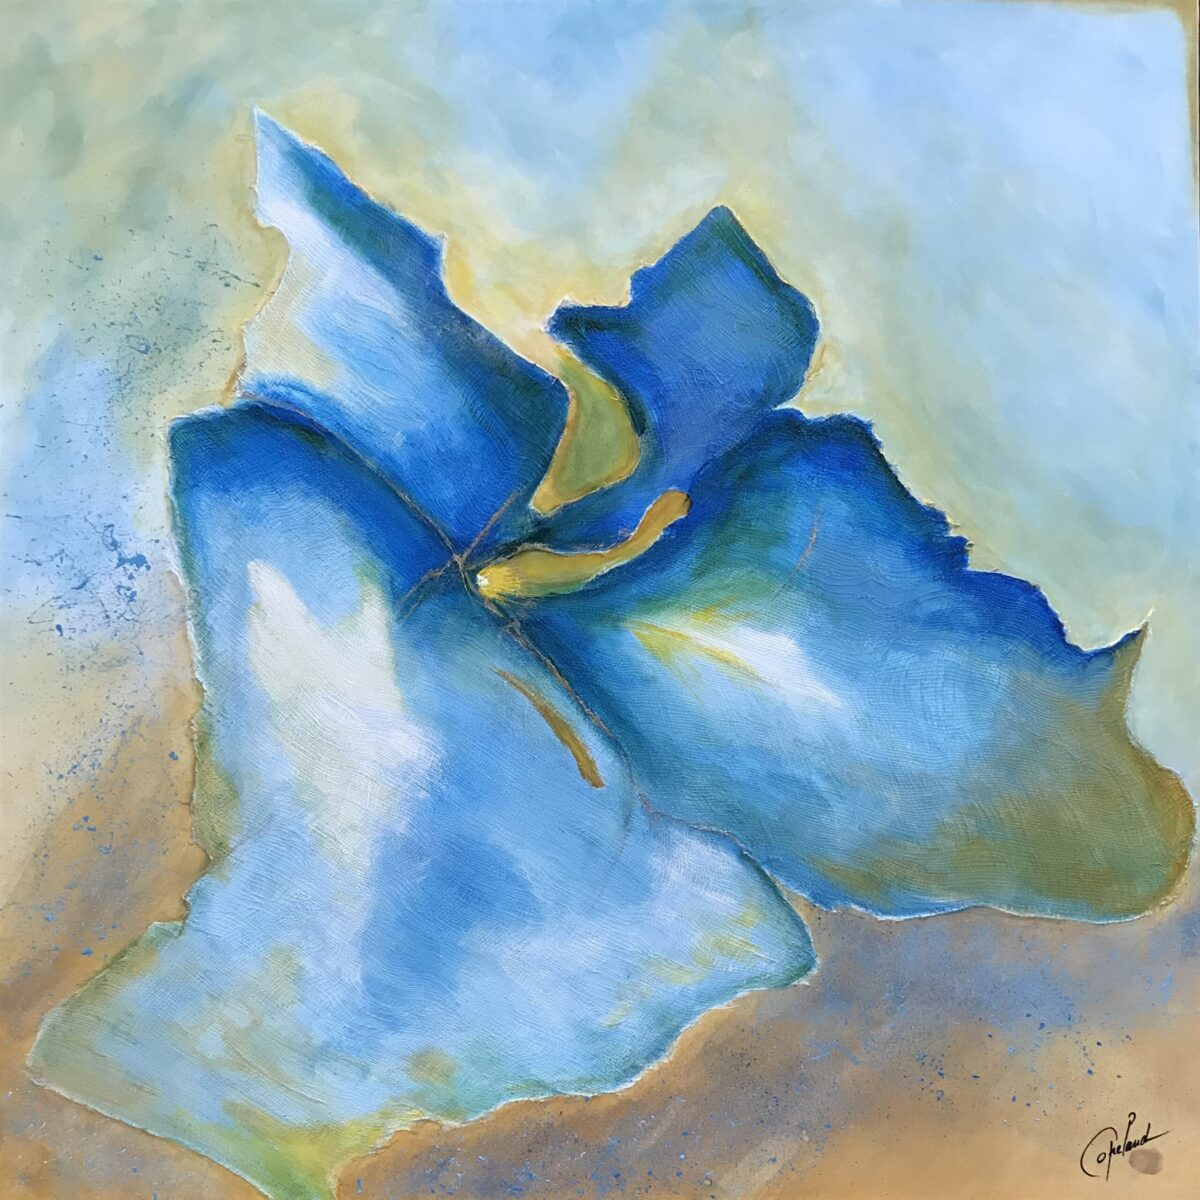 Patricia Copeland, art, abstract art, Copeland, Copeland artist painter, Canadian woman painter